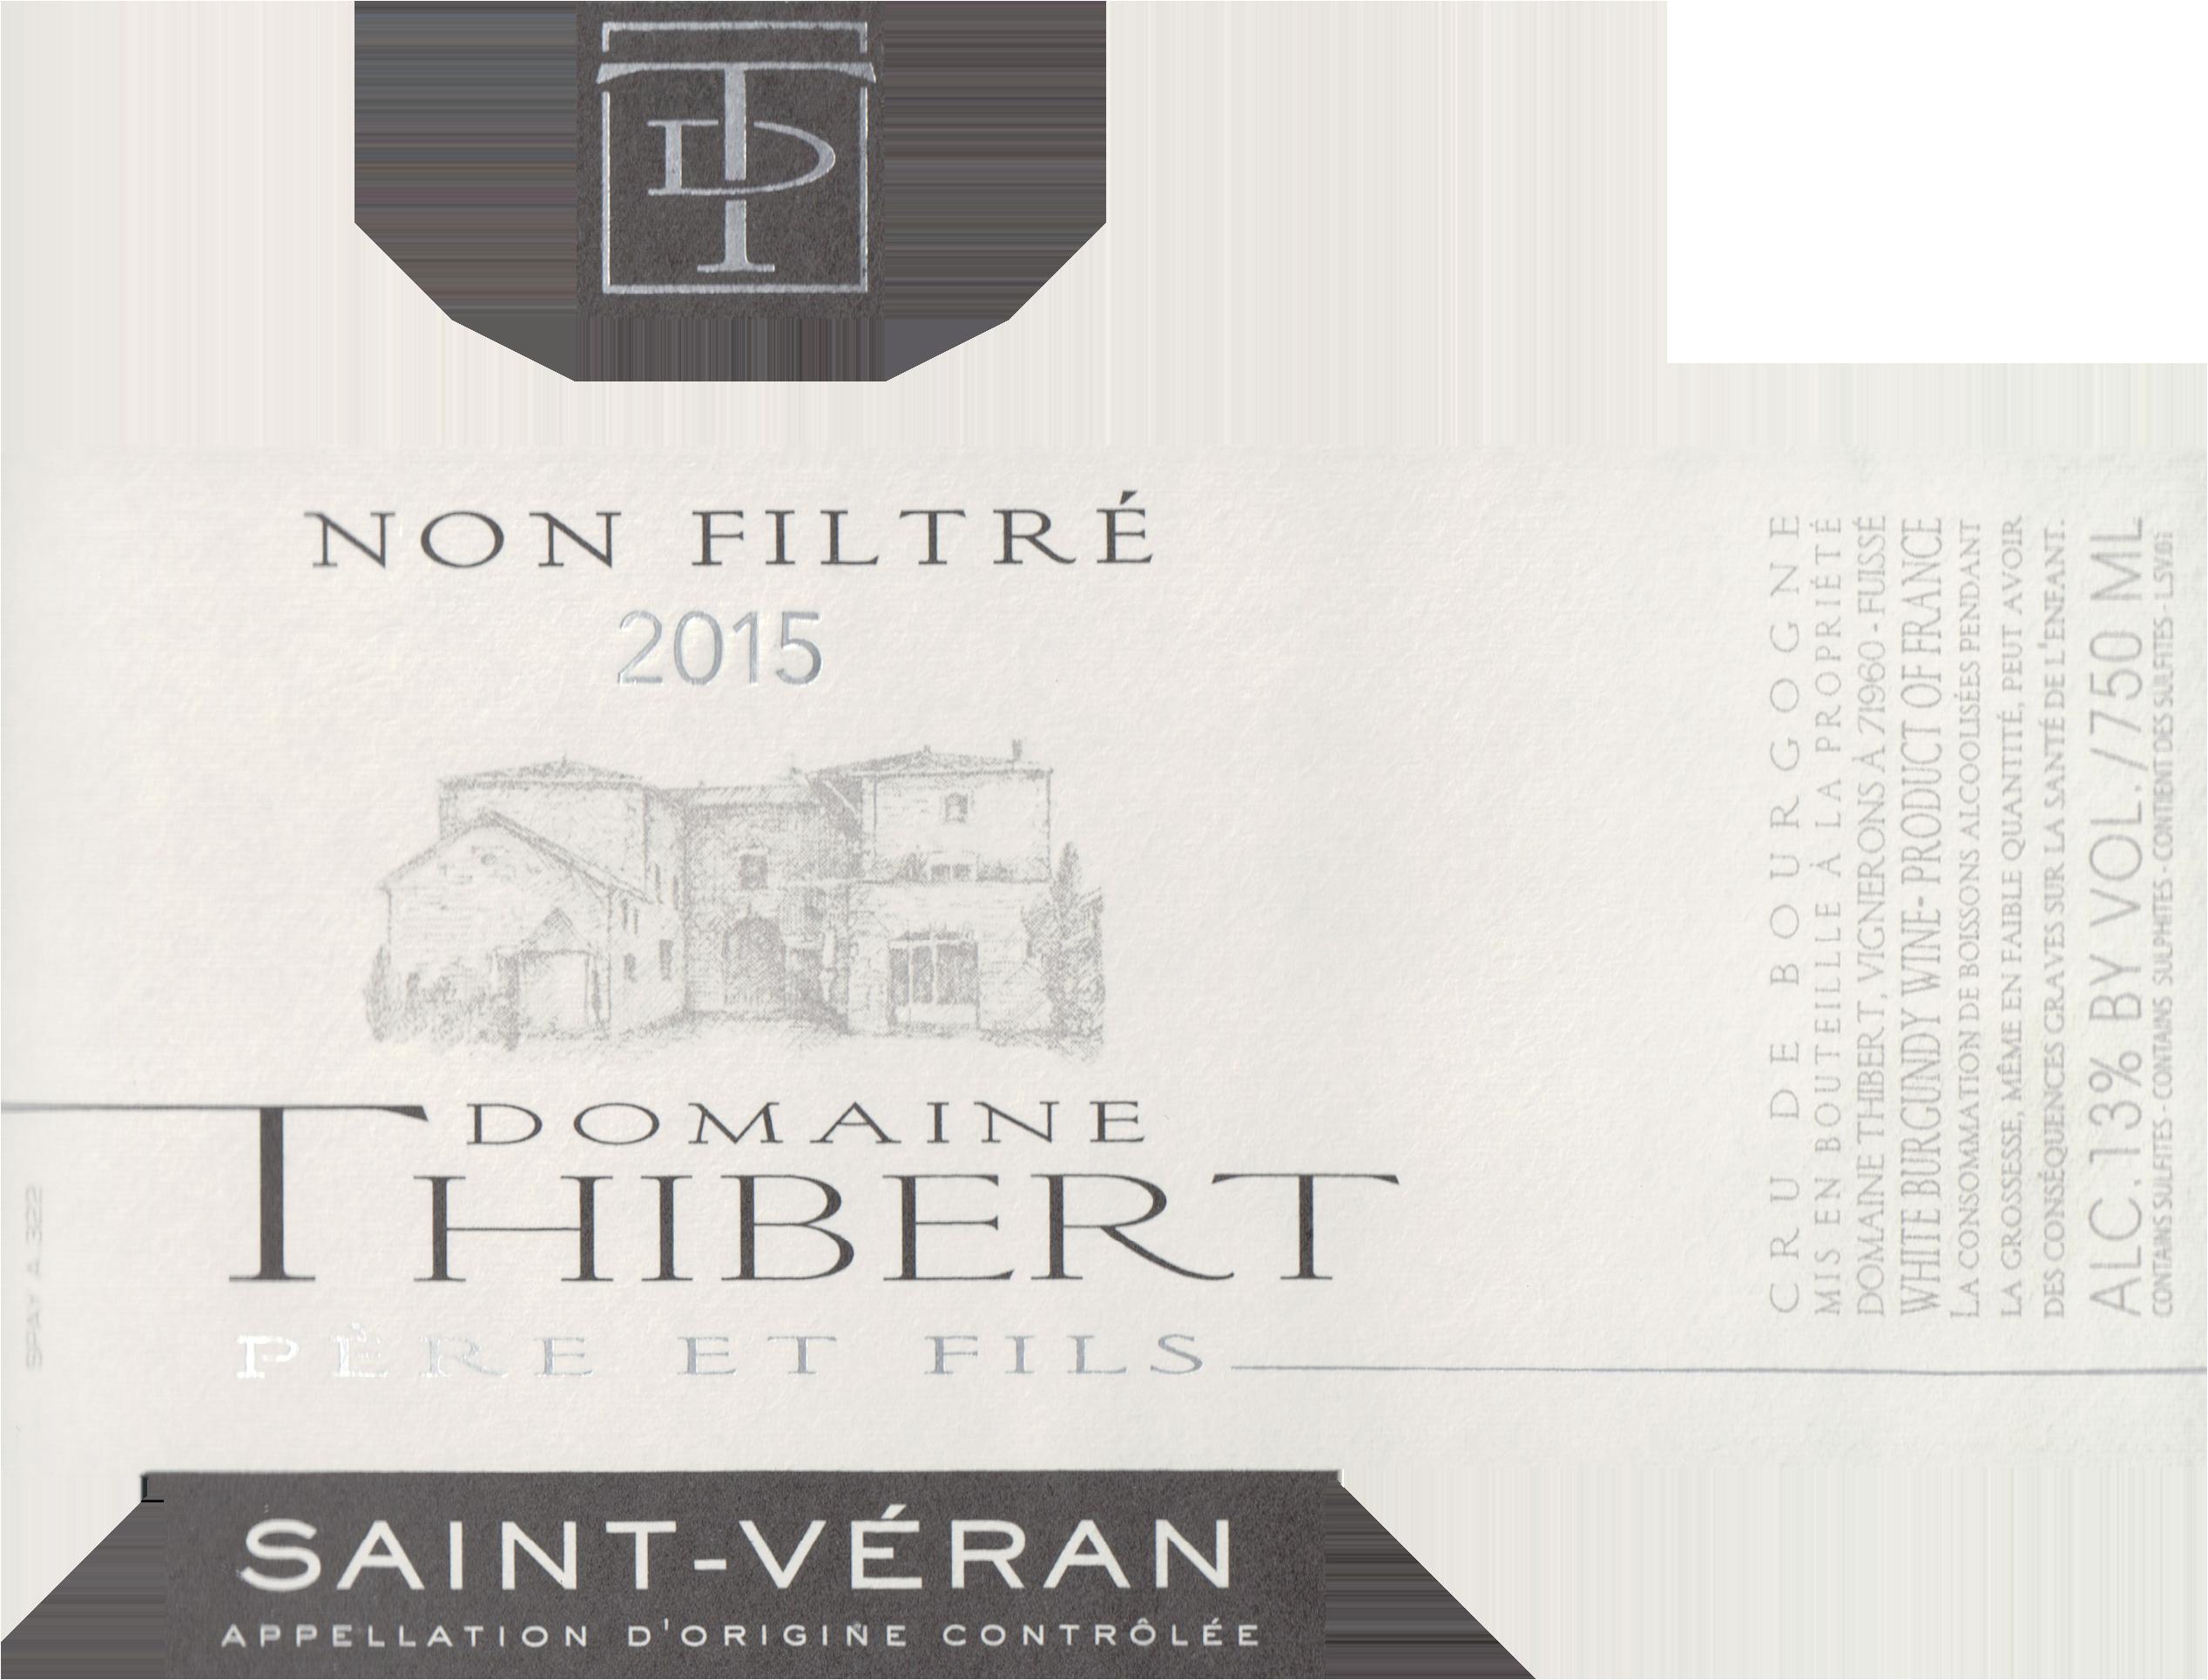 Domaine Thibert Saint Veran 2015